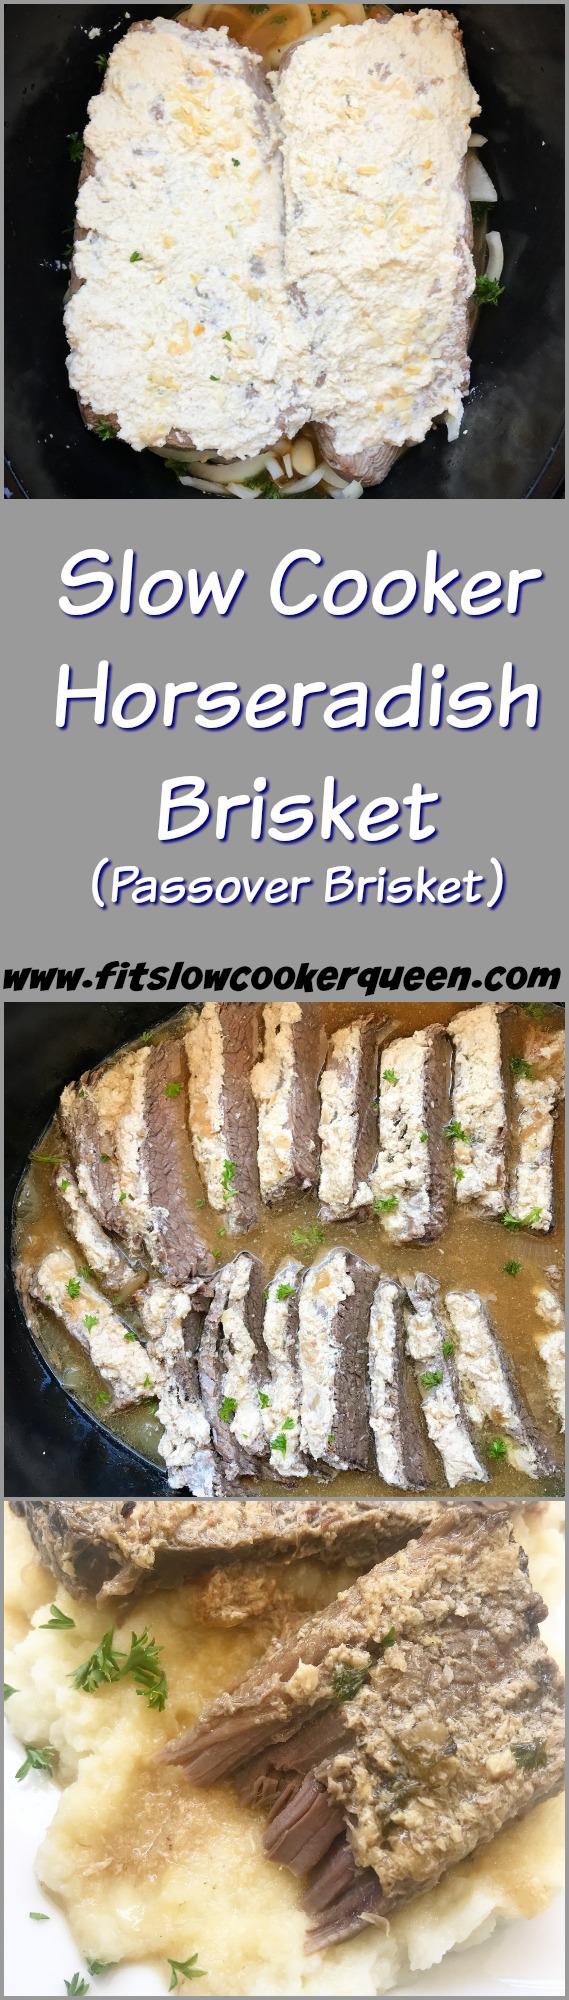 Slow Cooker Horseradish Brisket (Passover Brisket)